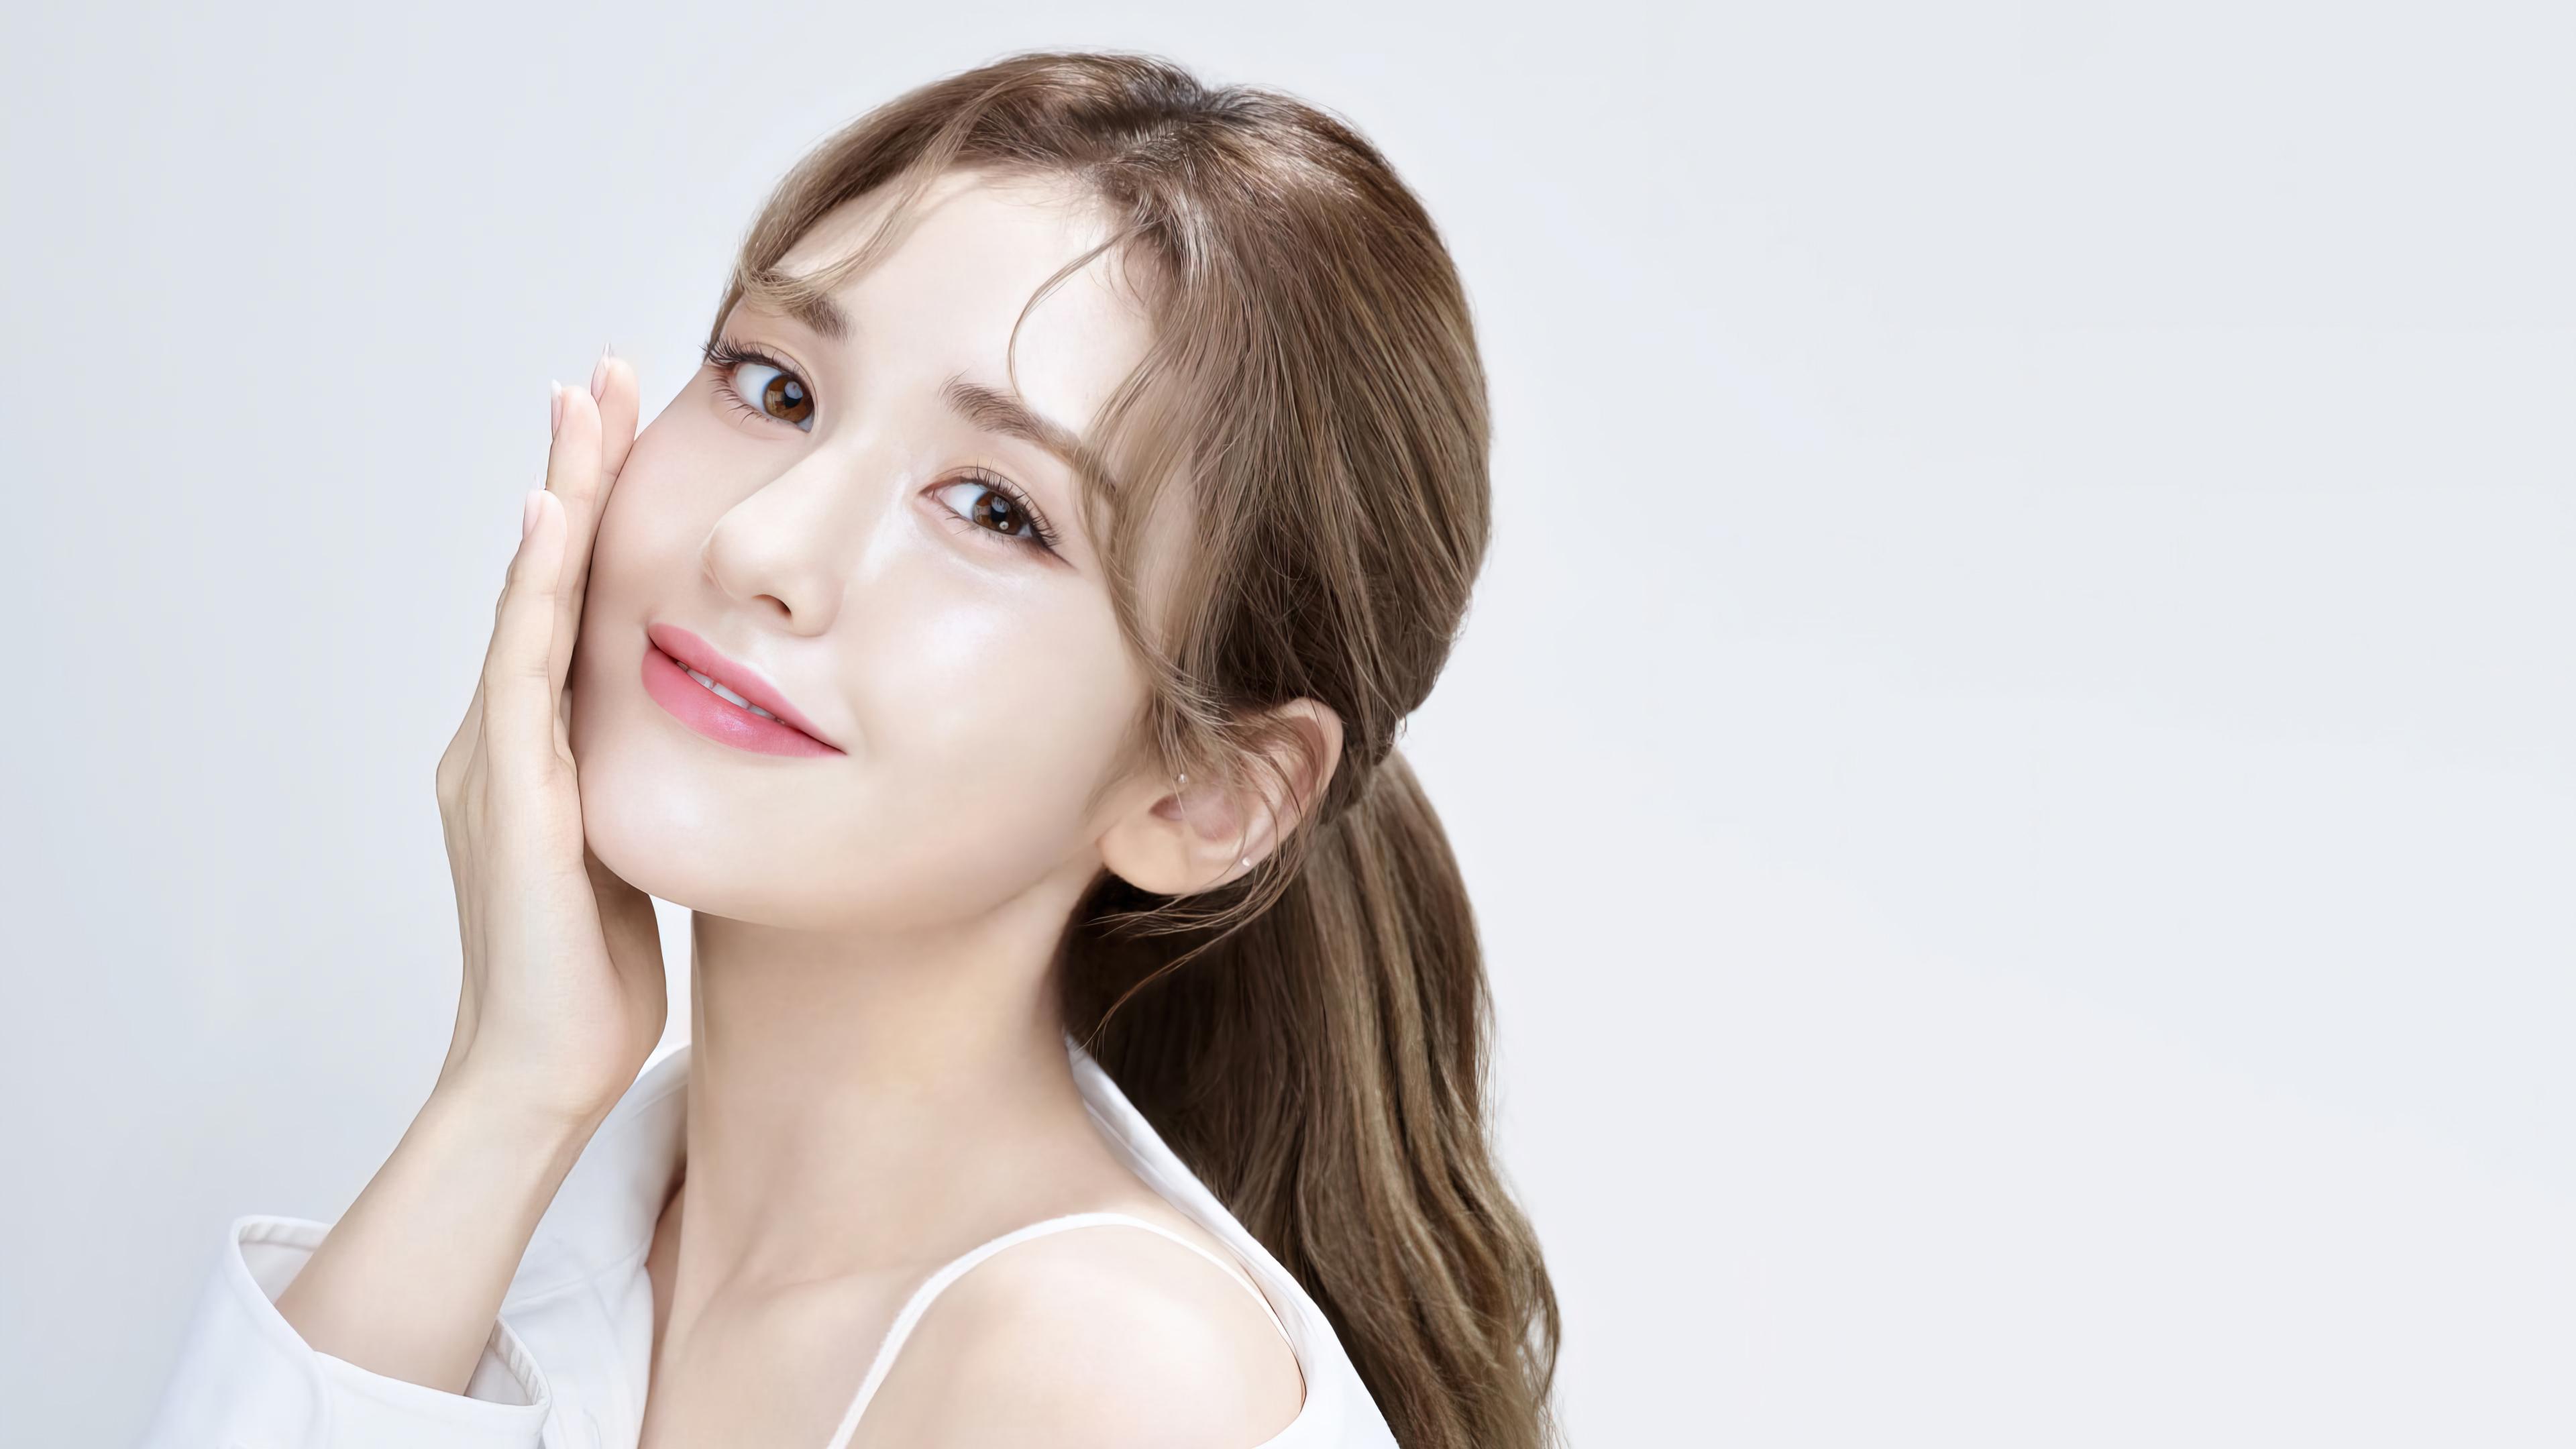 Wallpaper Jeon Somi